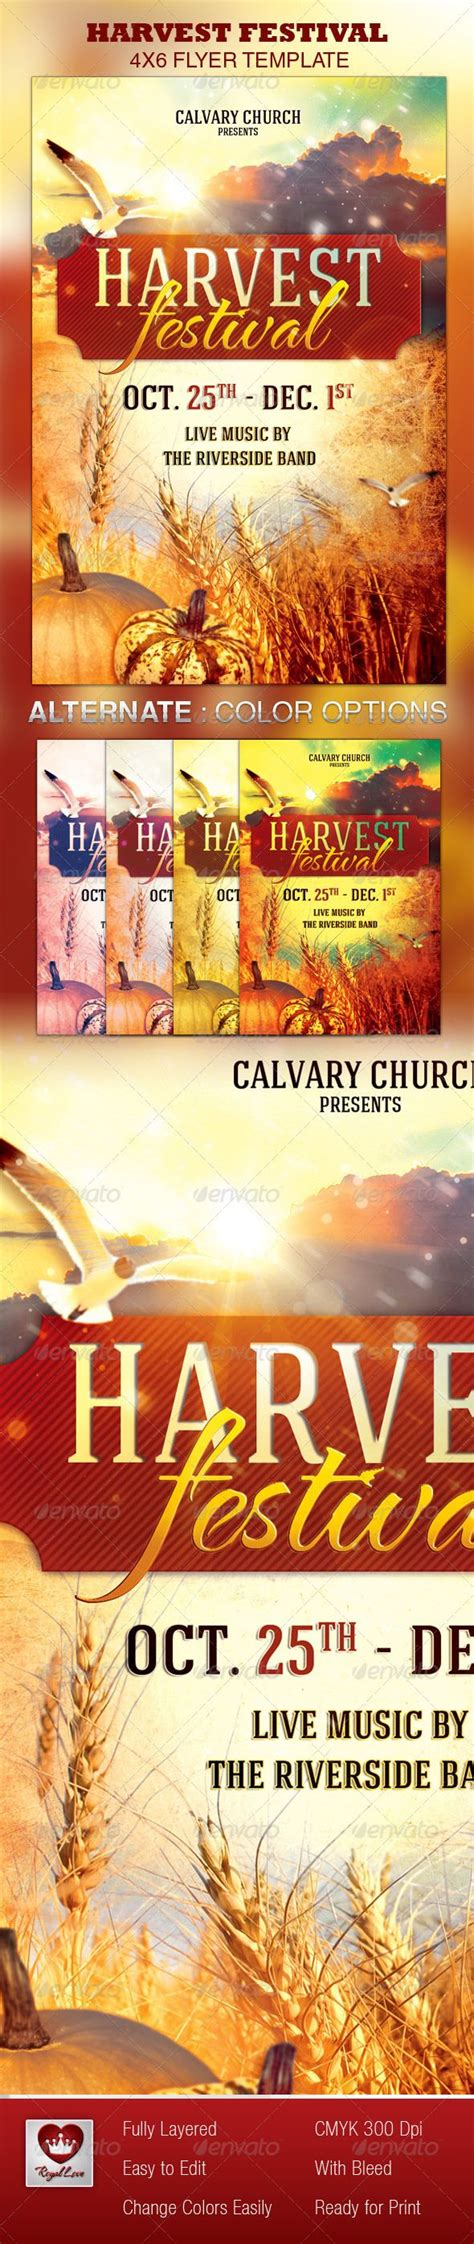 Harvest Festival Church Flyer Template Flyer Template Churches And Print Templates Harvest Festival Flyer Free Template